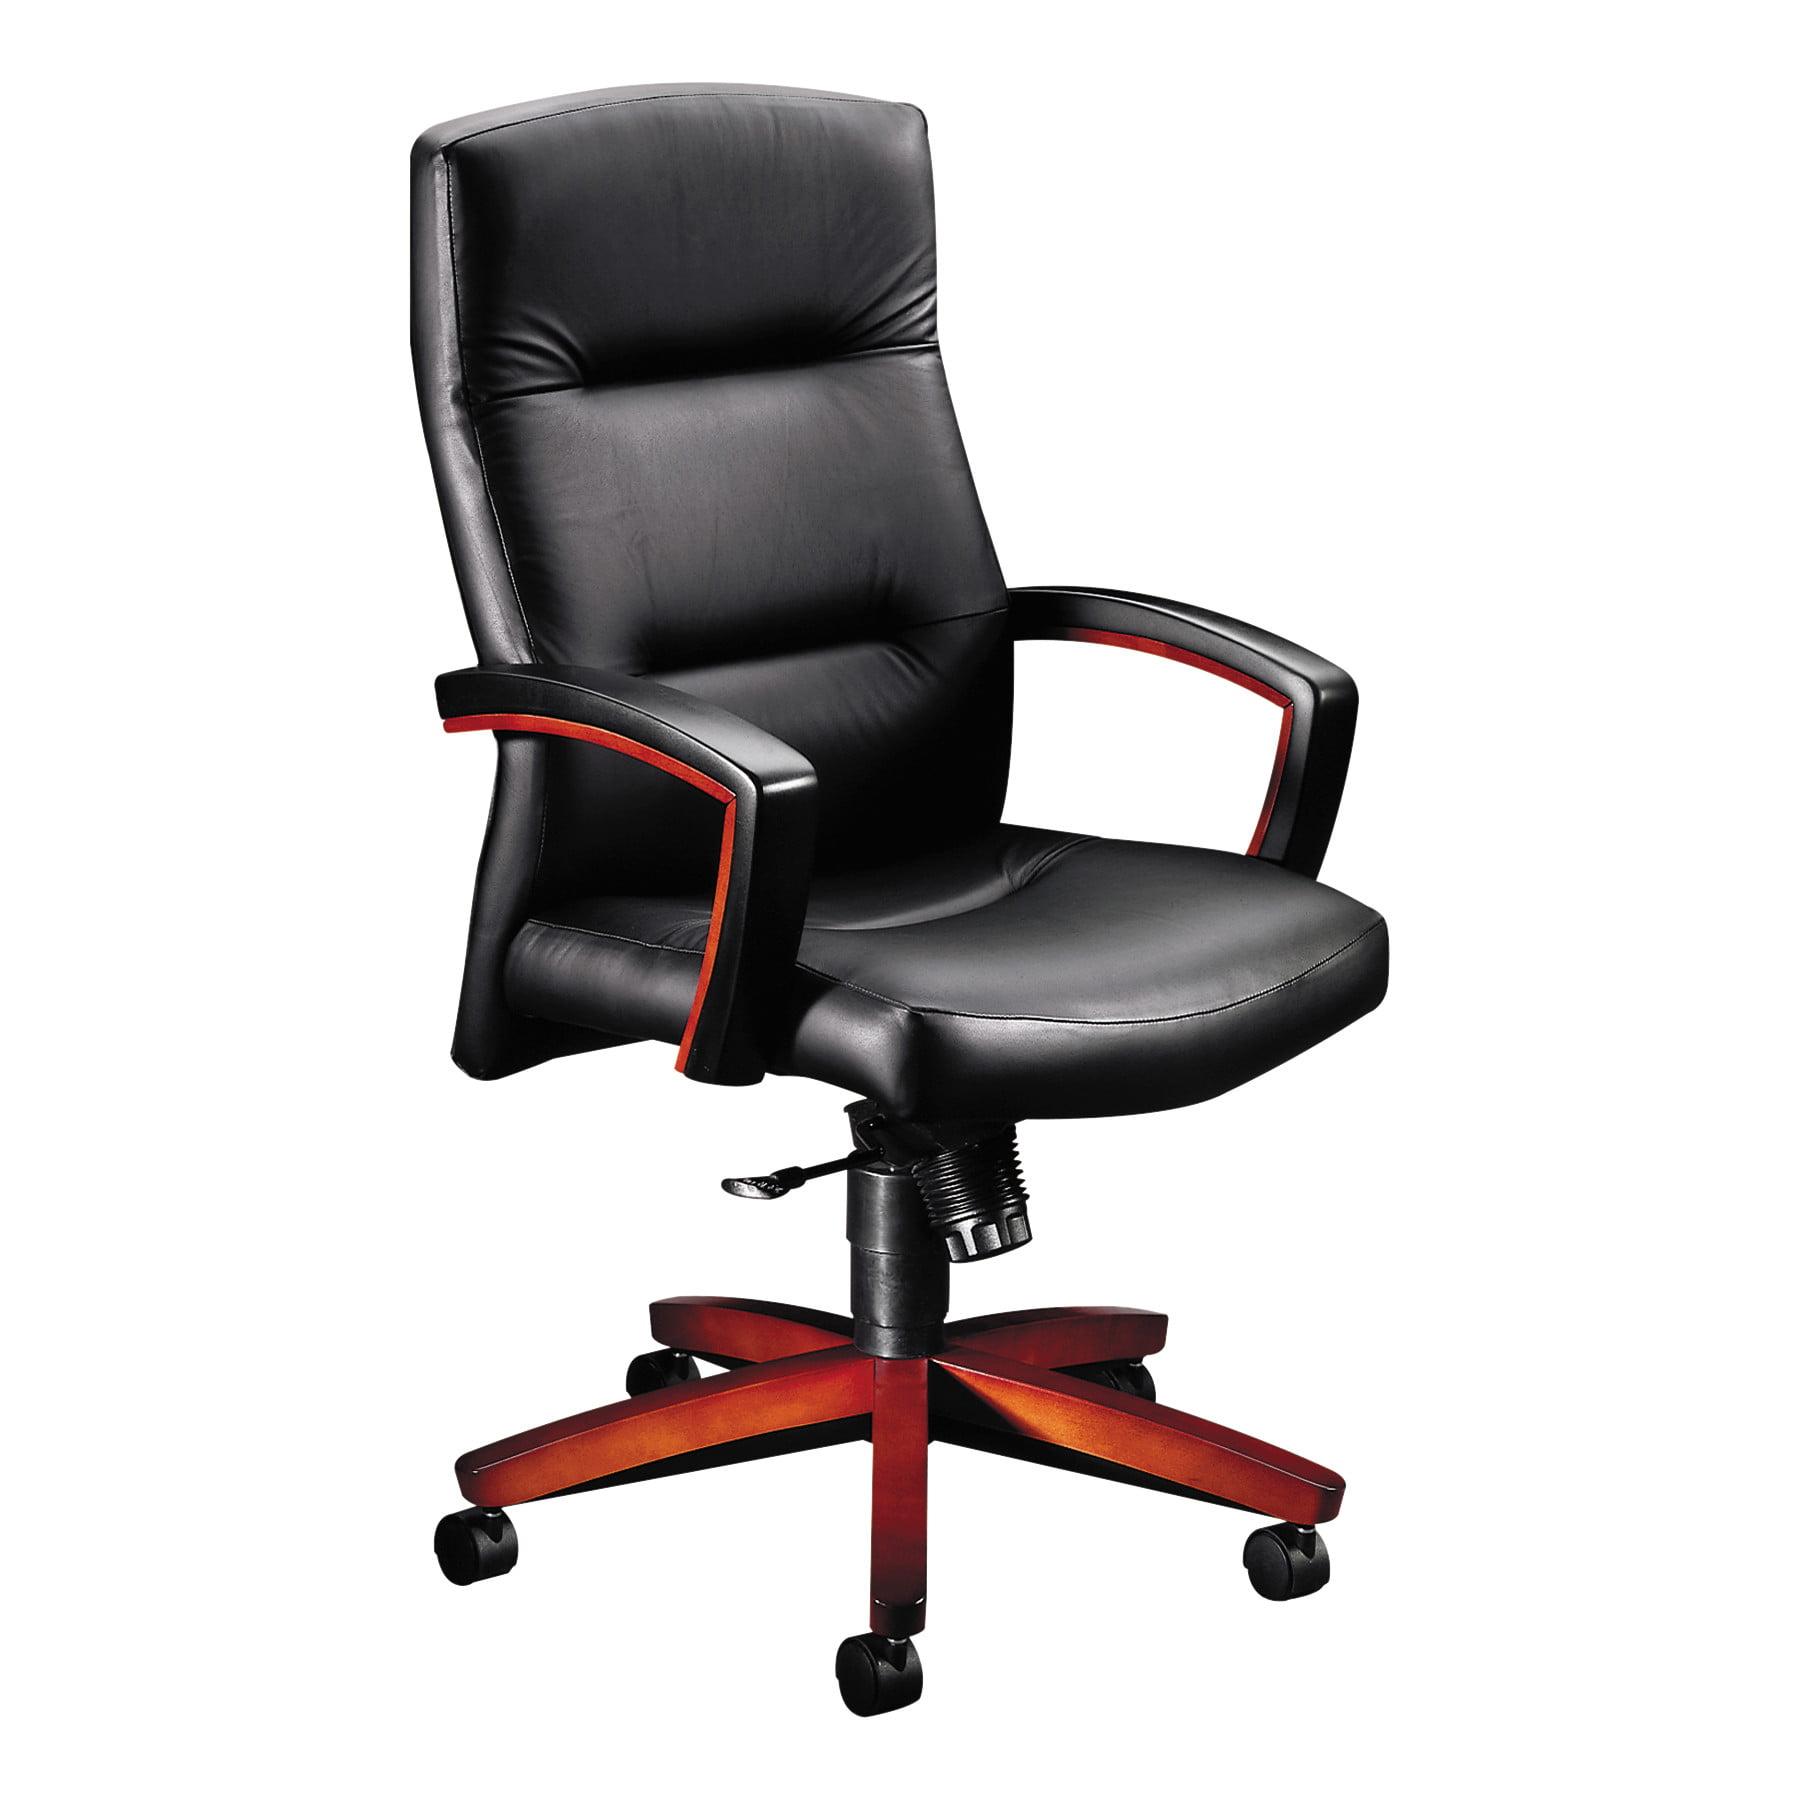 HON 5000 Series Executive High-Back Swivel/Tilt Chair, Black Leather/Henna Cherry